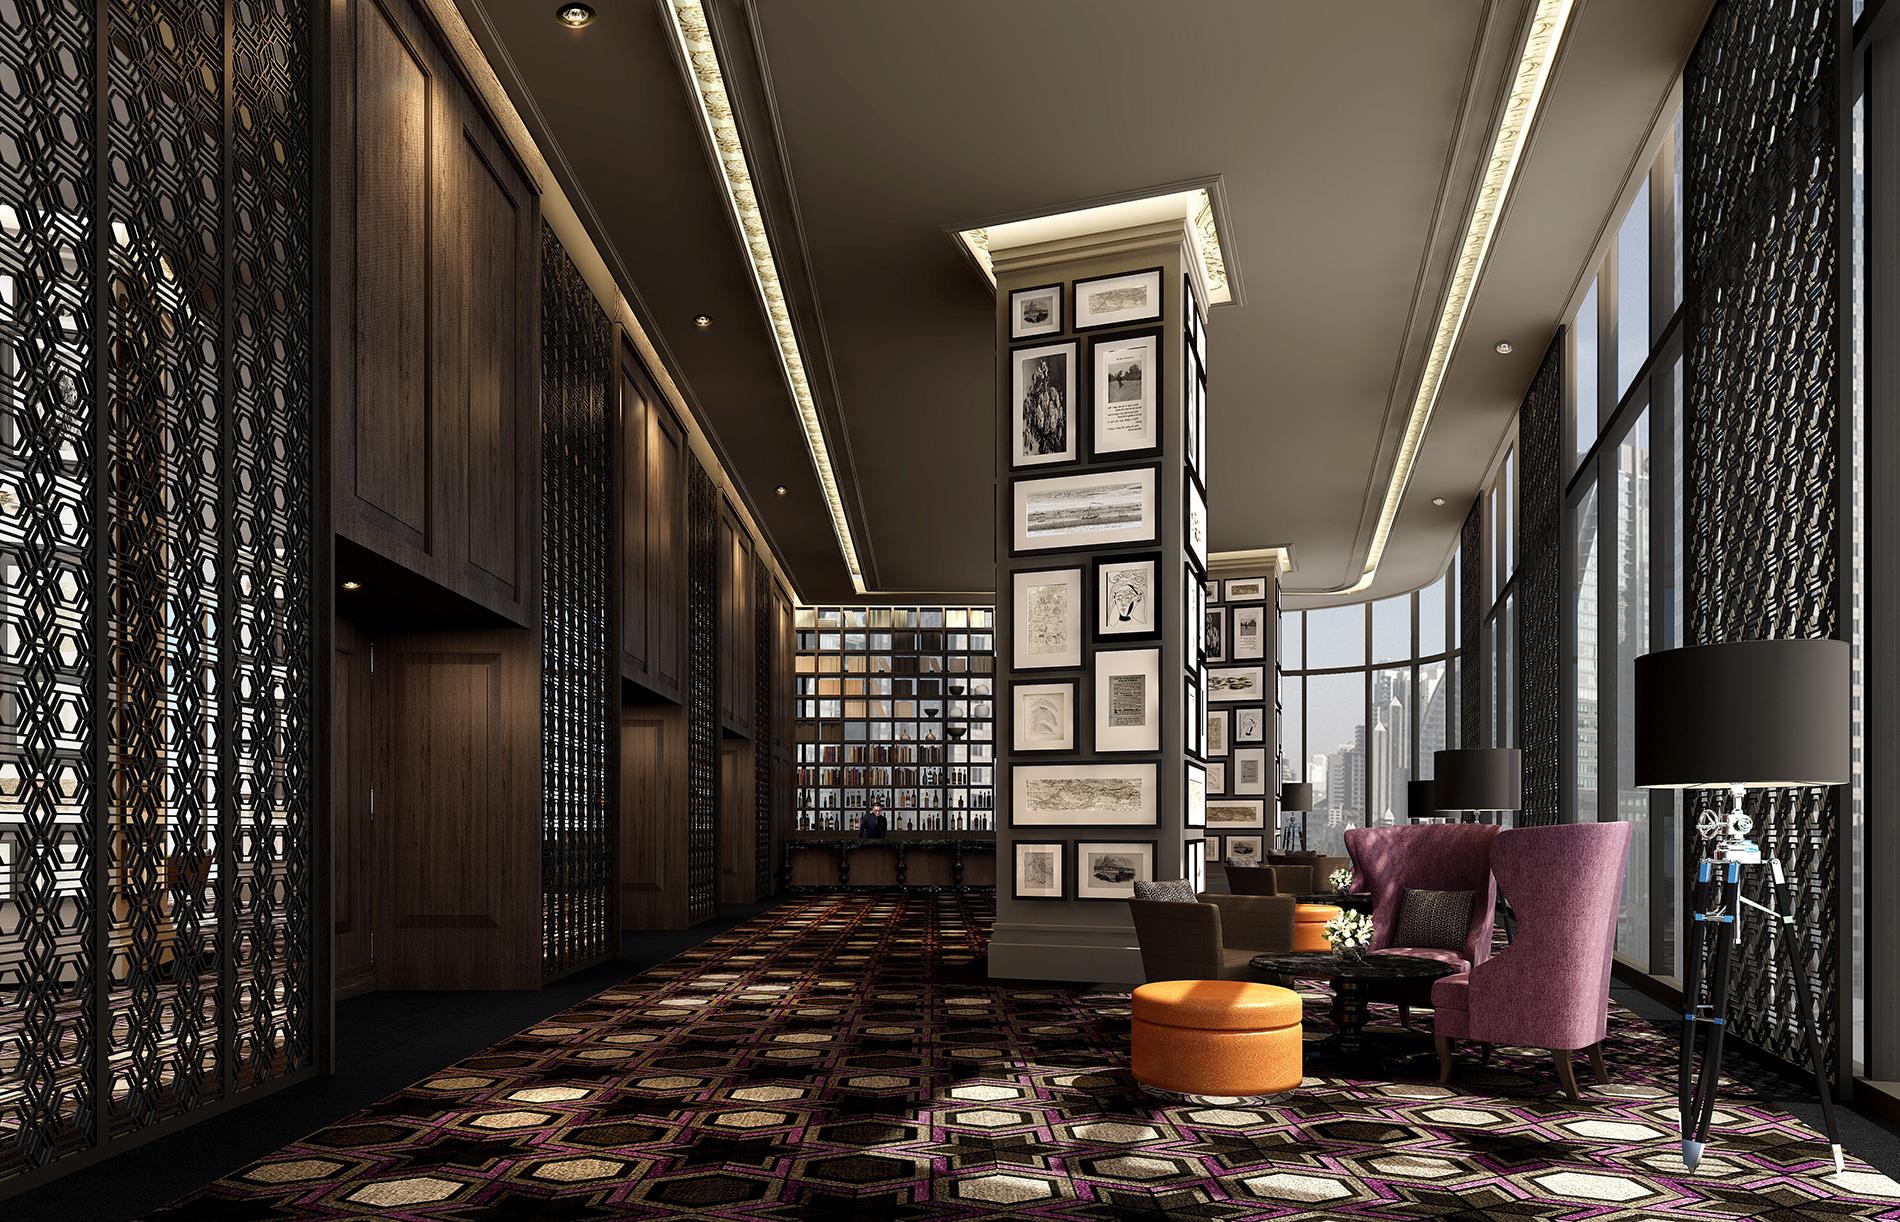 JW Marriott Hotel Bangkok Transforms Grand Ballroom And